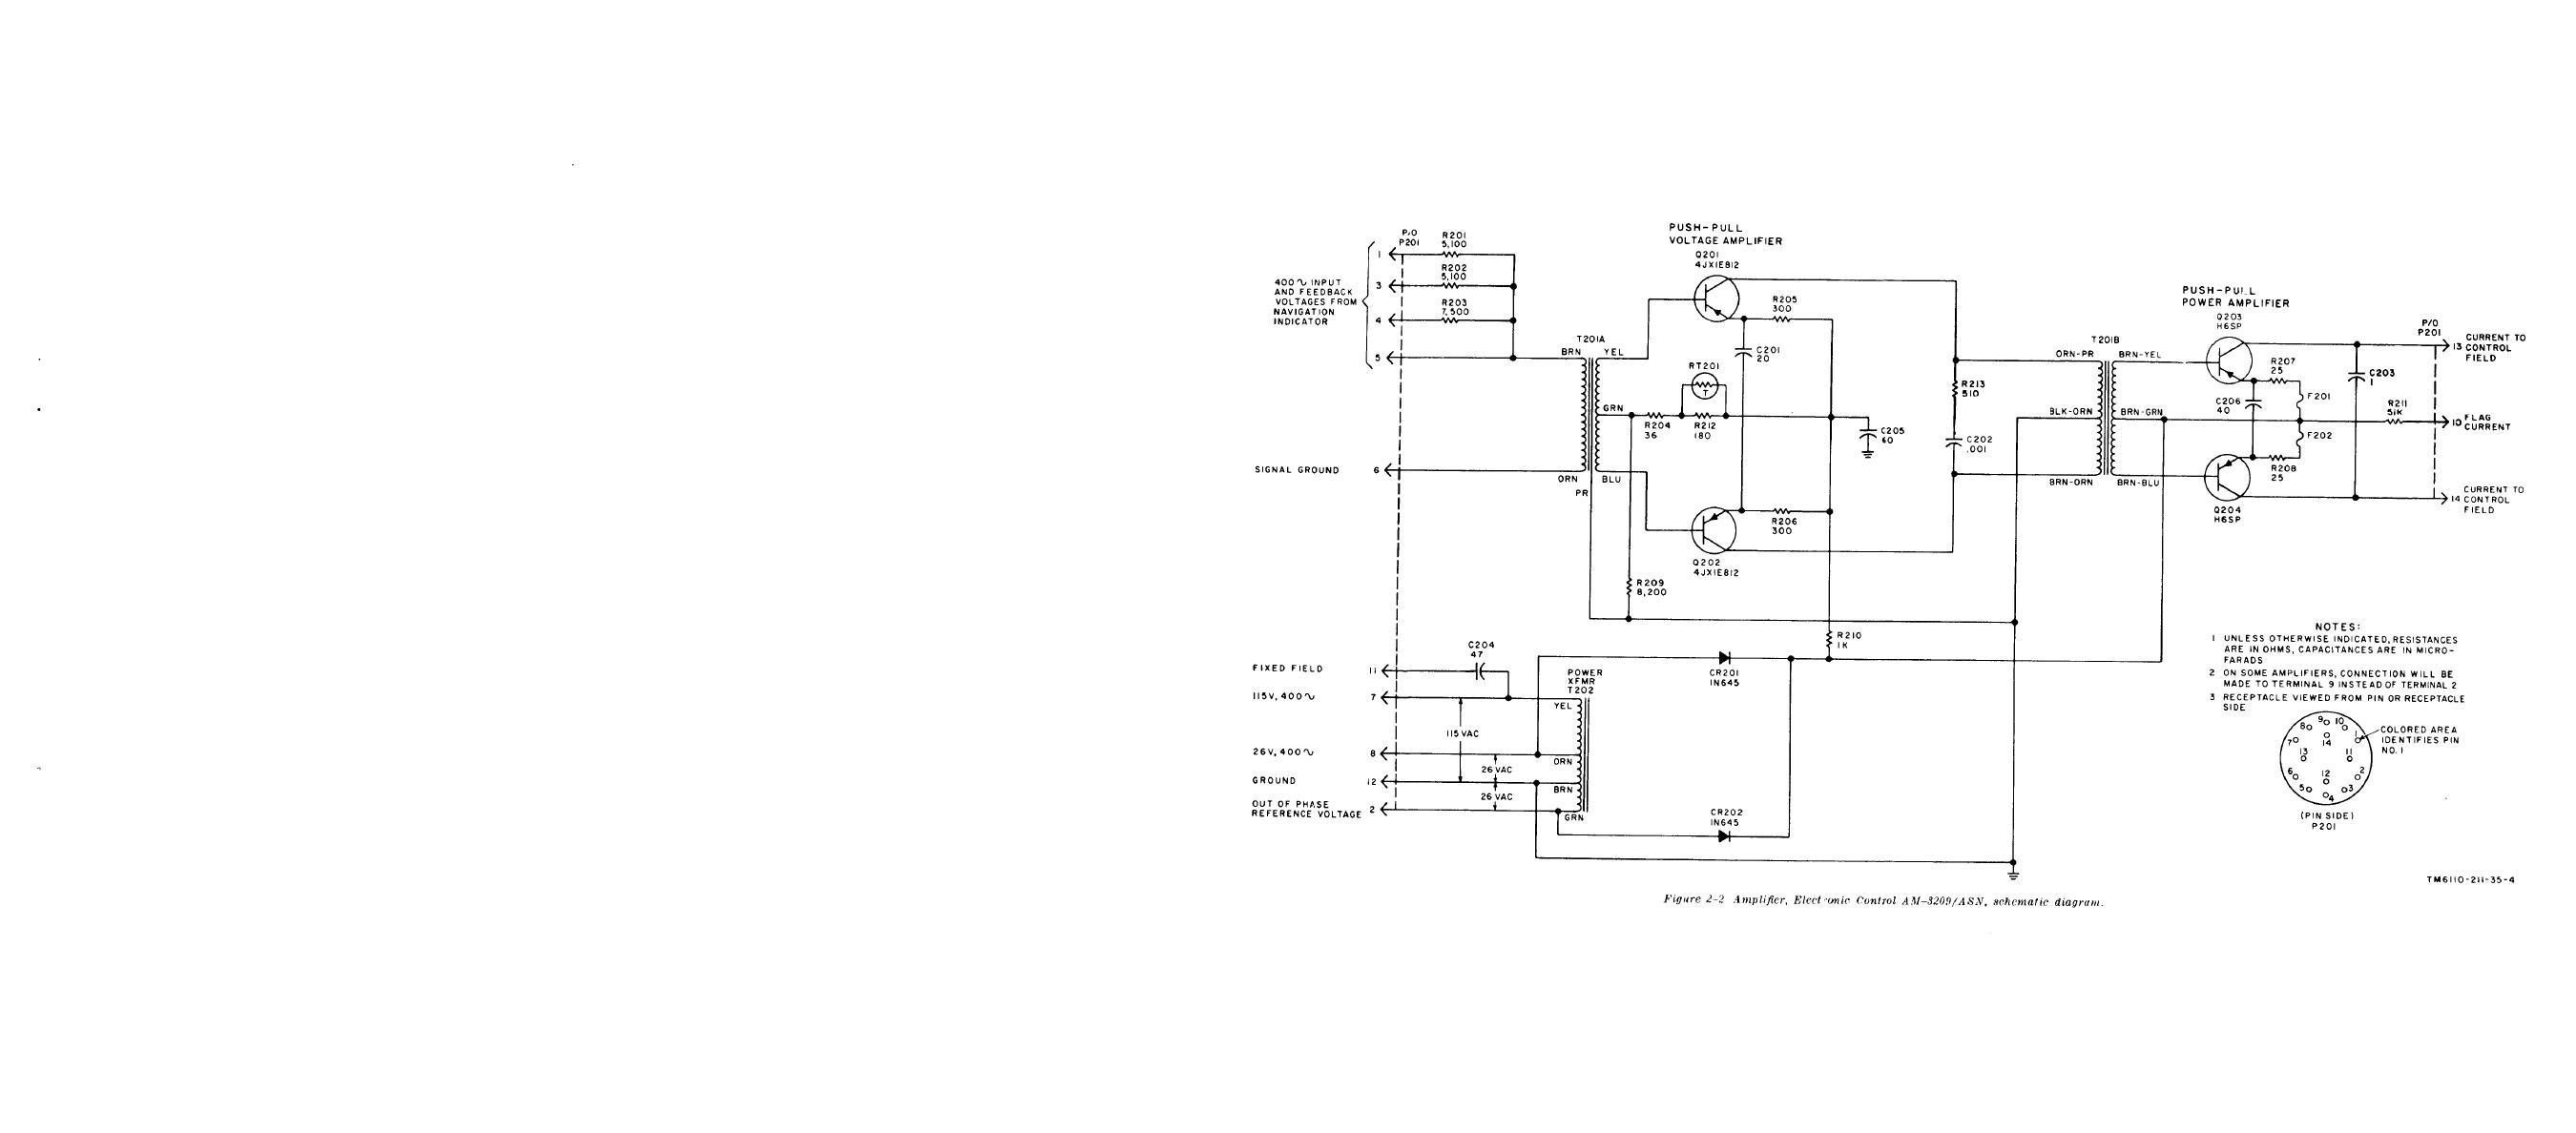 Figure 2 Amplifier Electronic Control Am 3209 Asn Schematic Current Another Electronics Circuit Schematics Diagram